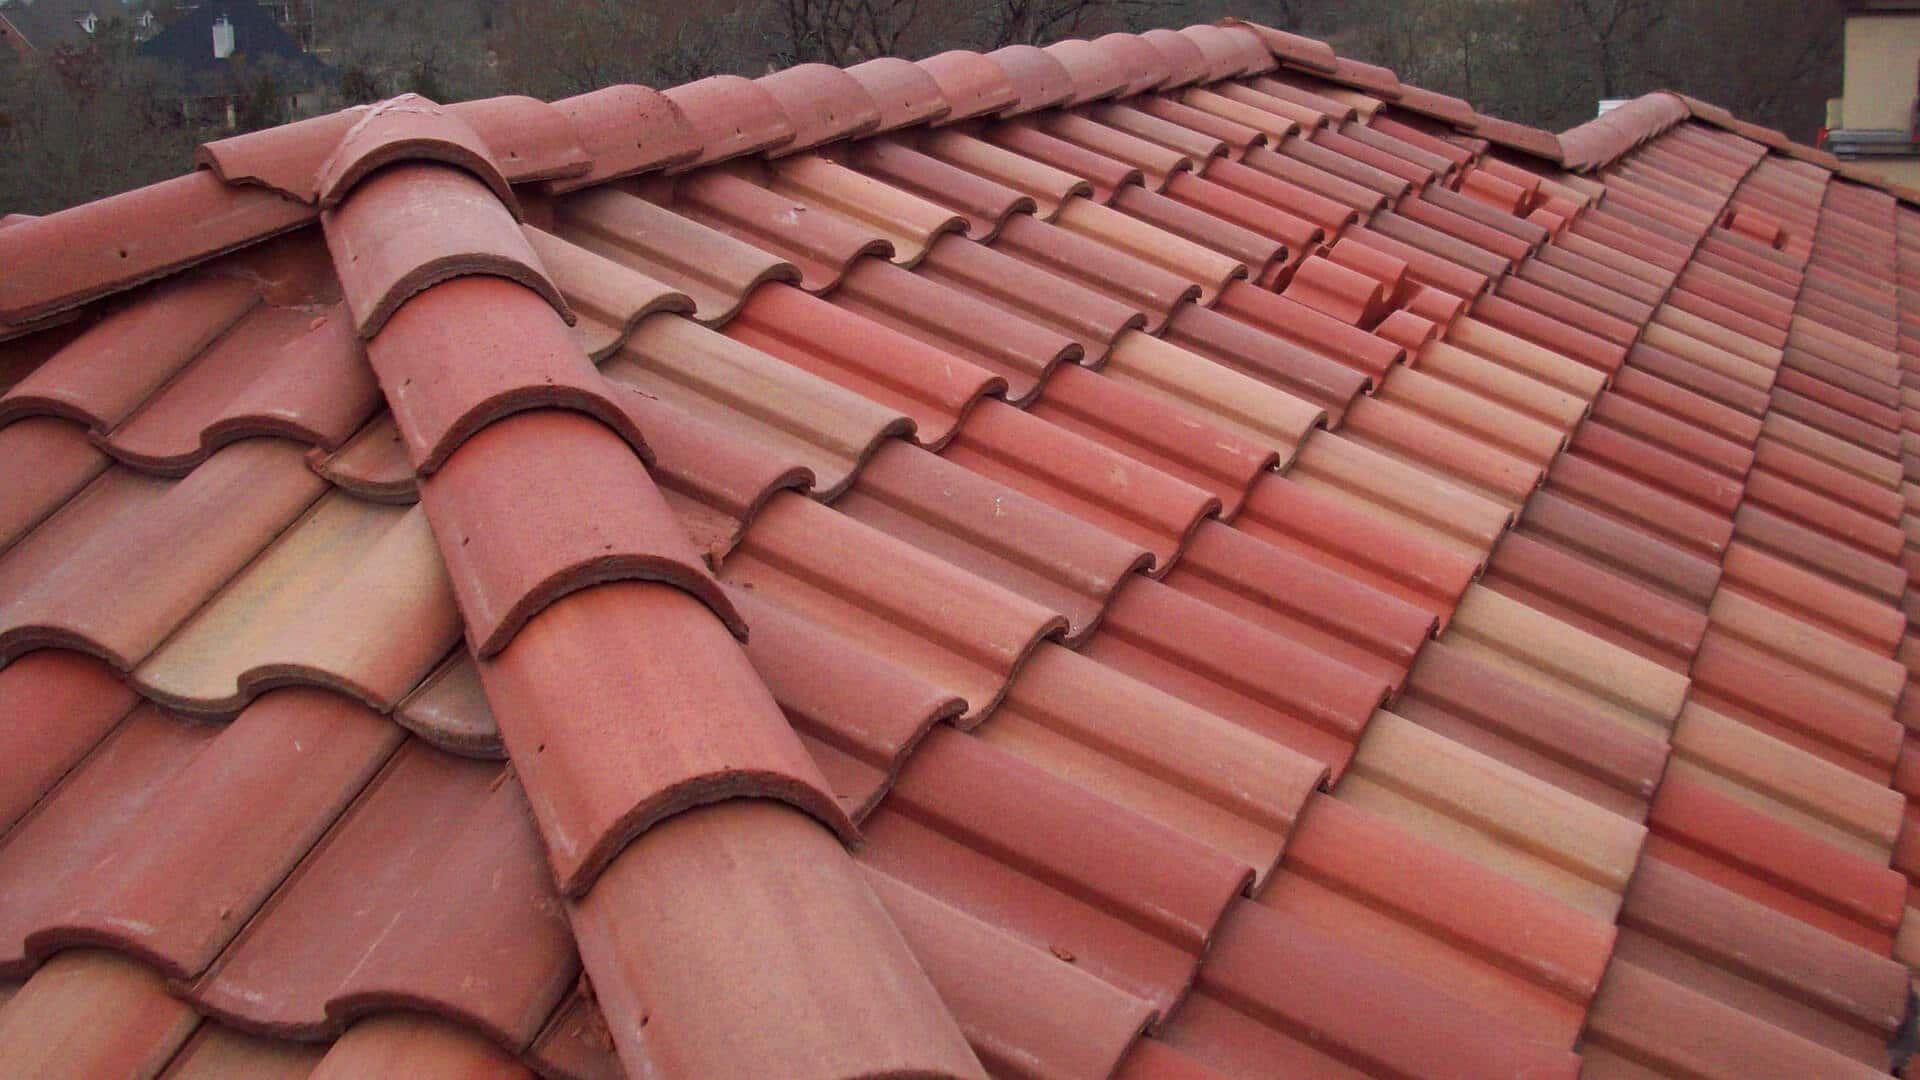 Concrete Clay Tile Auckland In 2020 Concrete Tiles Clay Tiles Concrete Roof Tiles